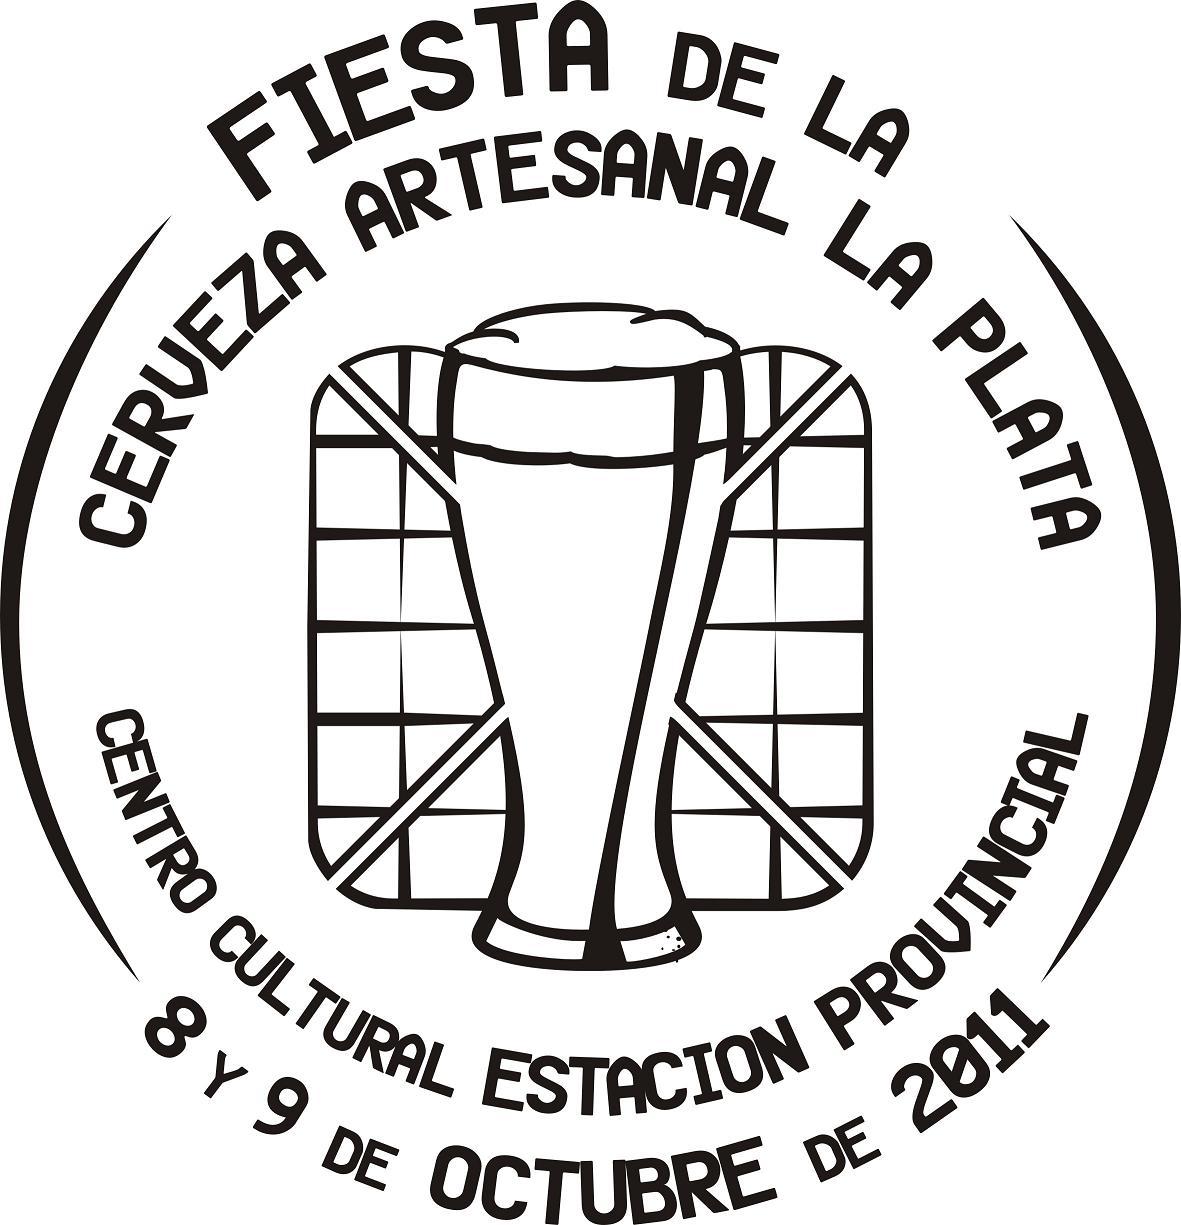 Encuentro: Fiesta de la cerveza artesanal